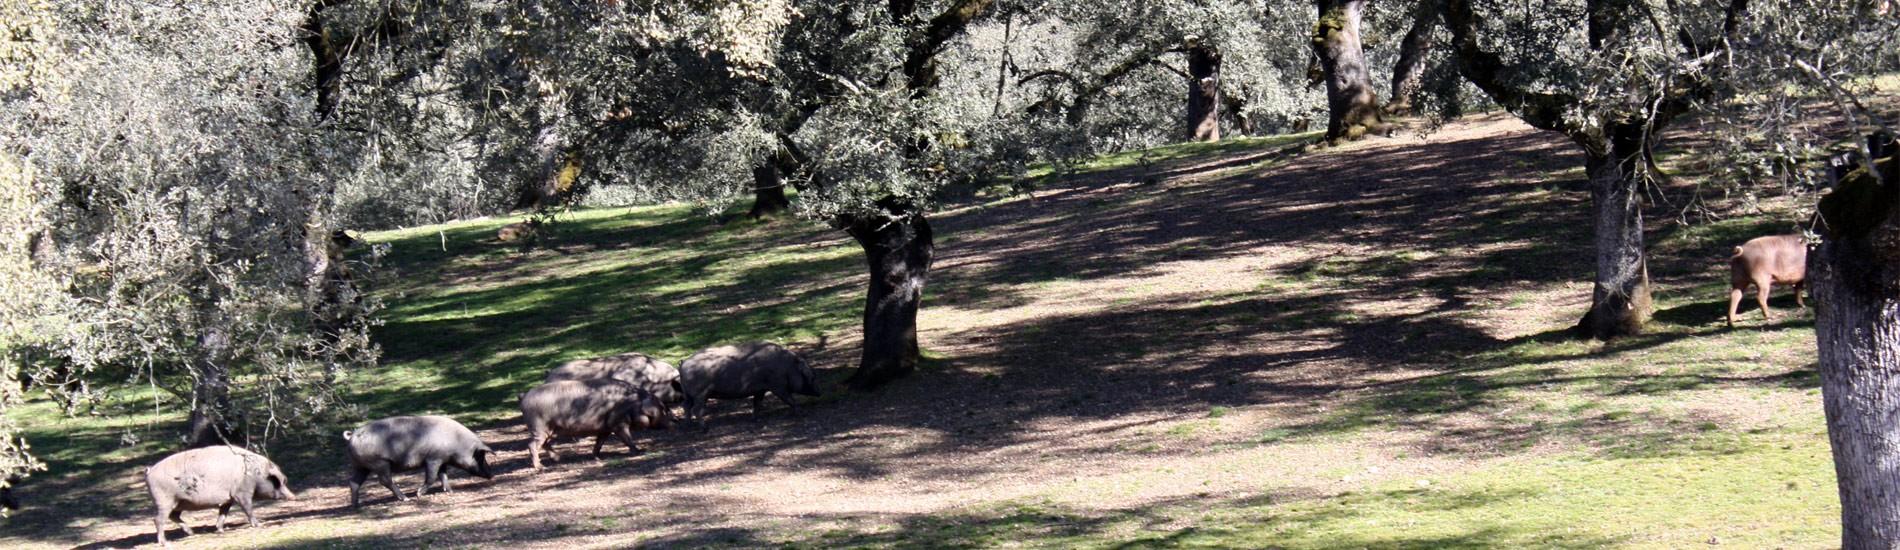 Iberian pigs, raised in freedom in the Dehesa